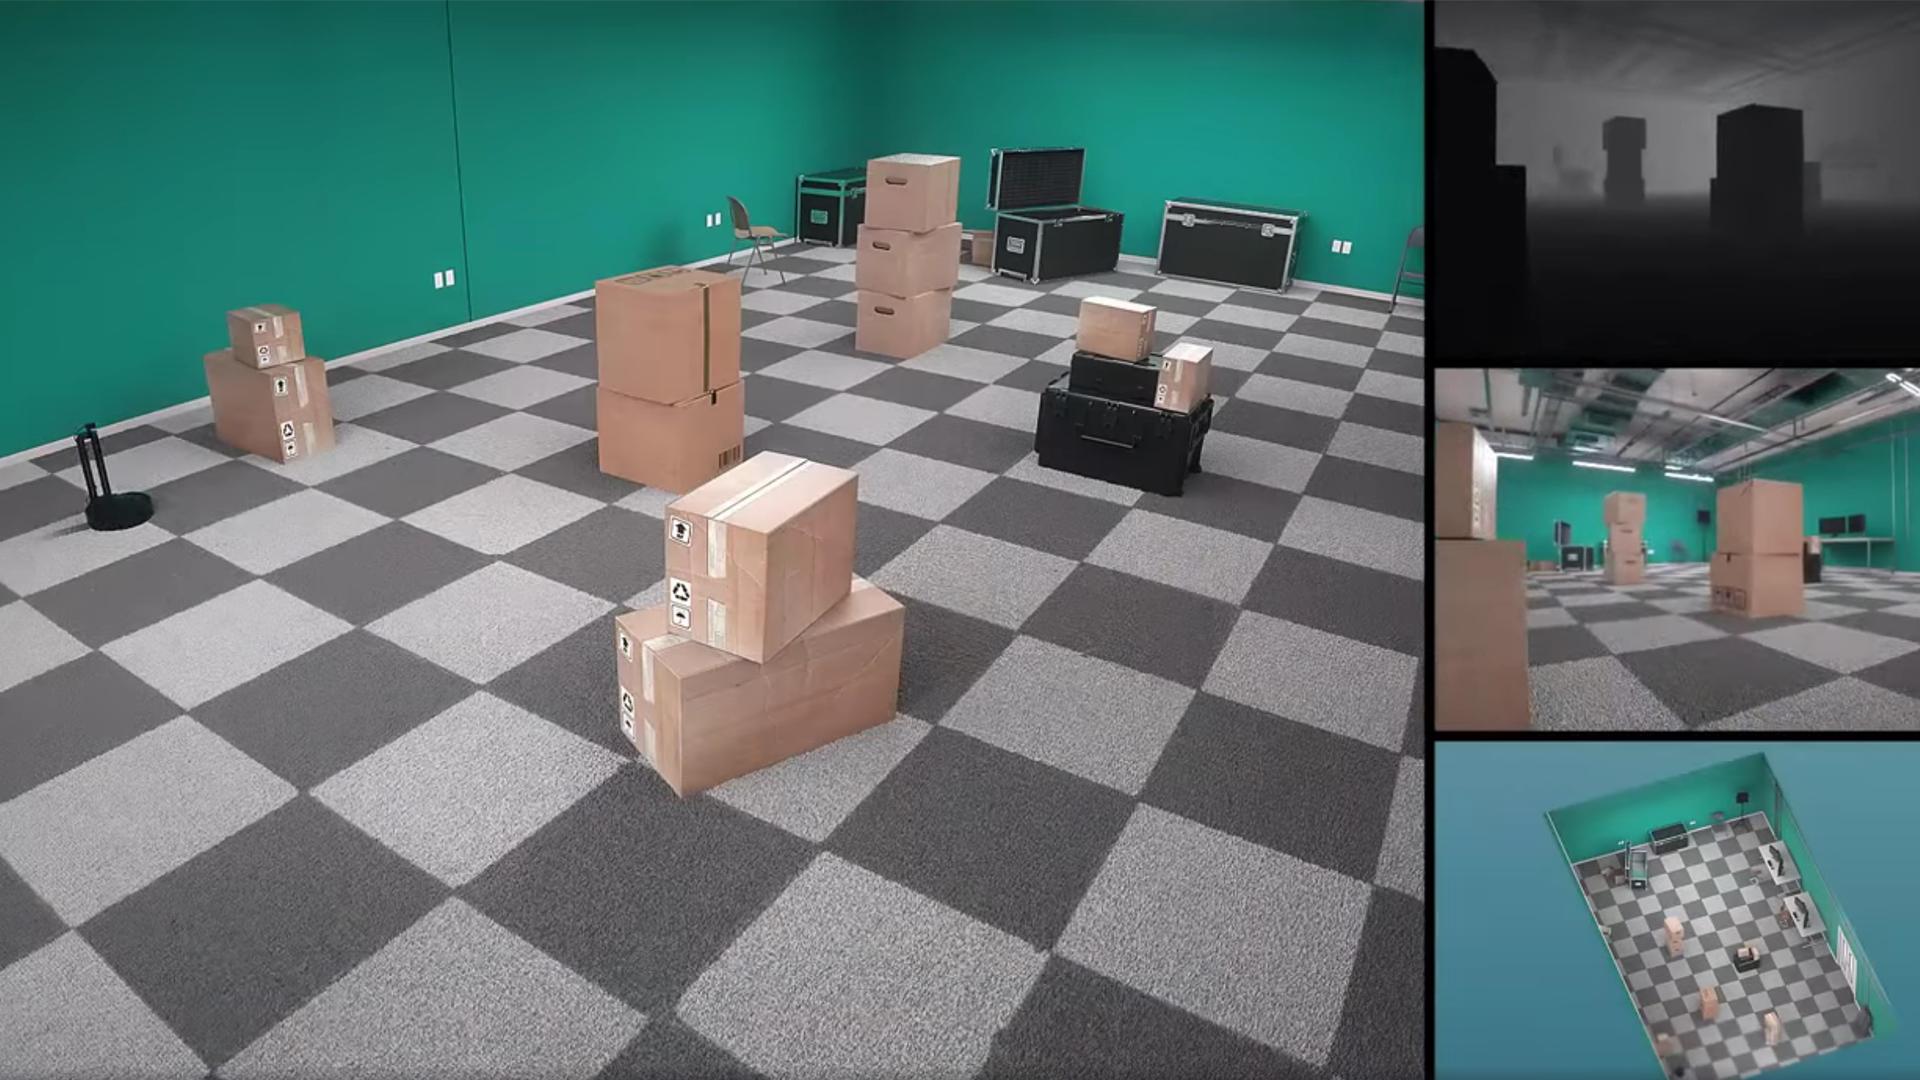 Habitat 2.0 running training simulations